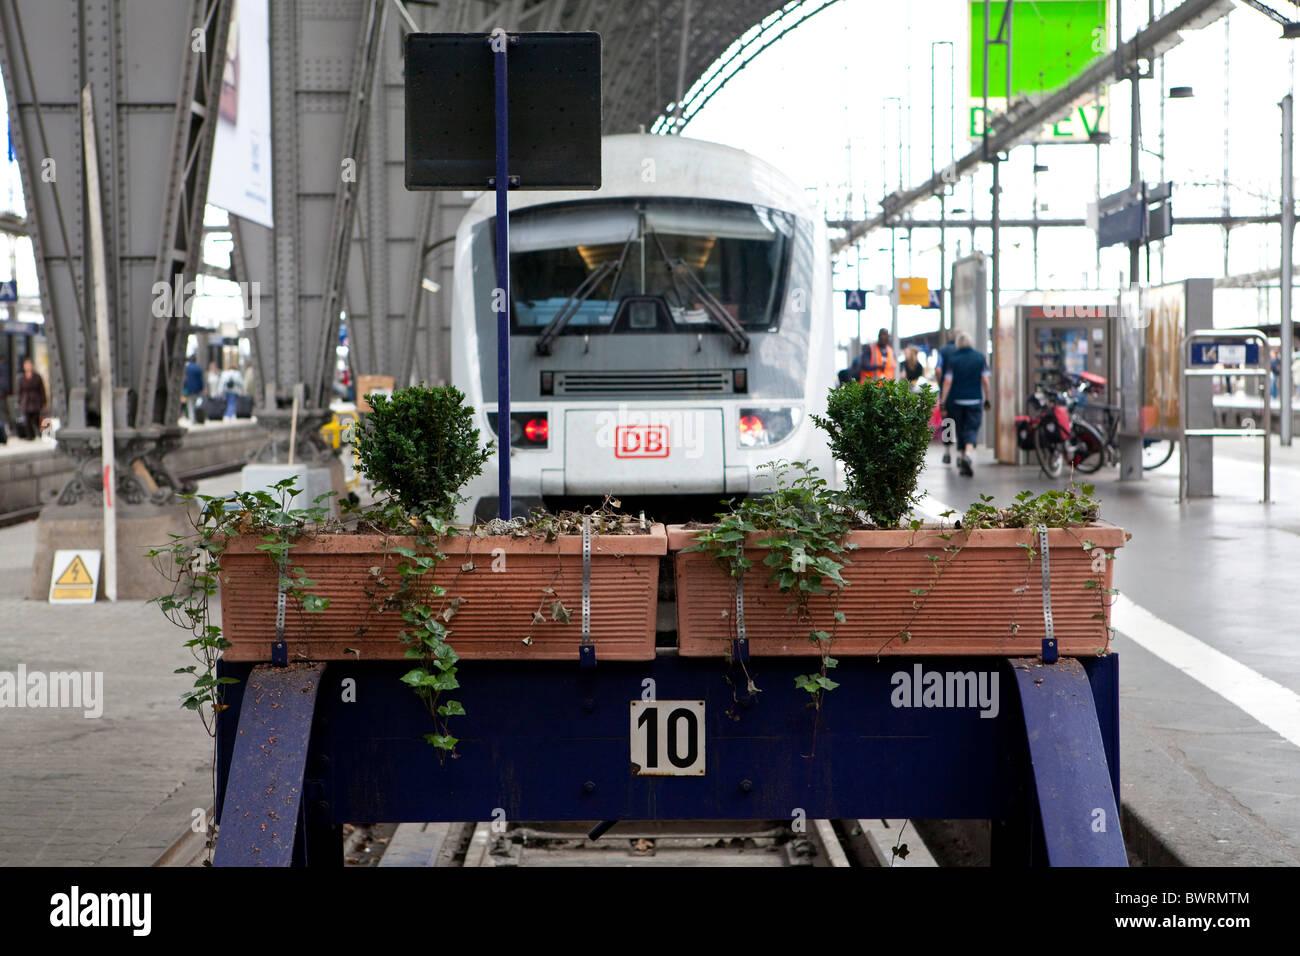 A regional train at a platform, Frankfurt central Station, Frankfurt am Main, Hesse, Germany, Europe - Stock Image